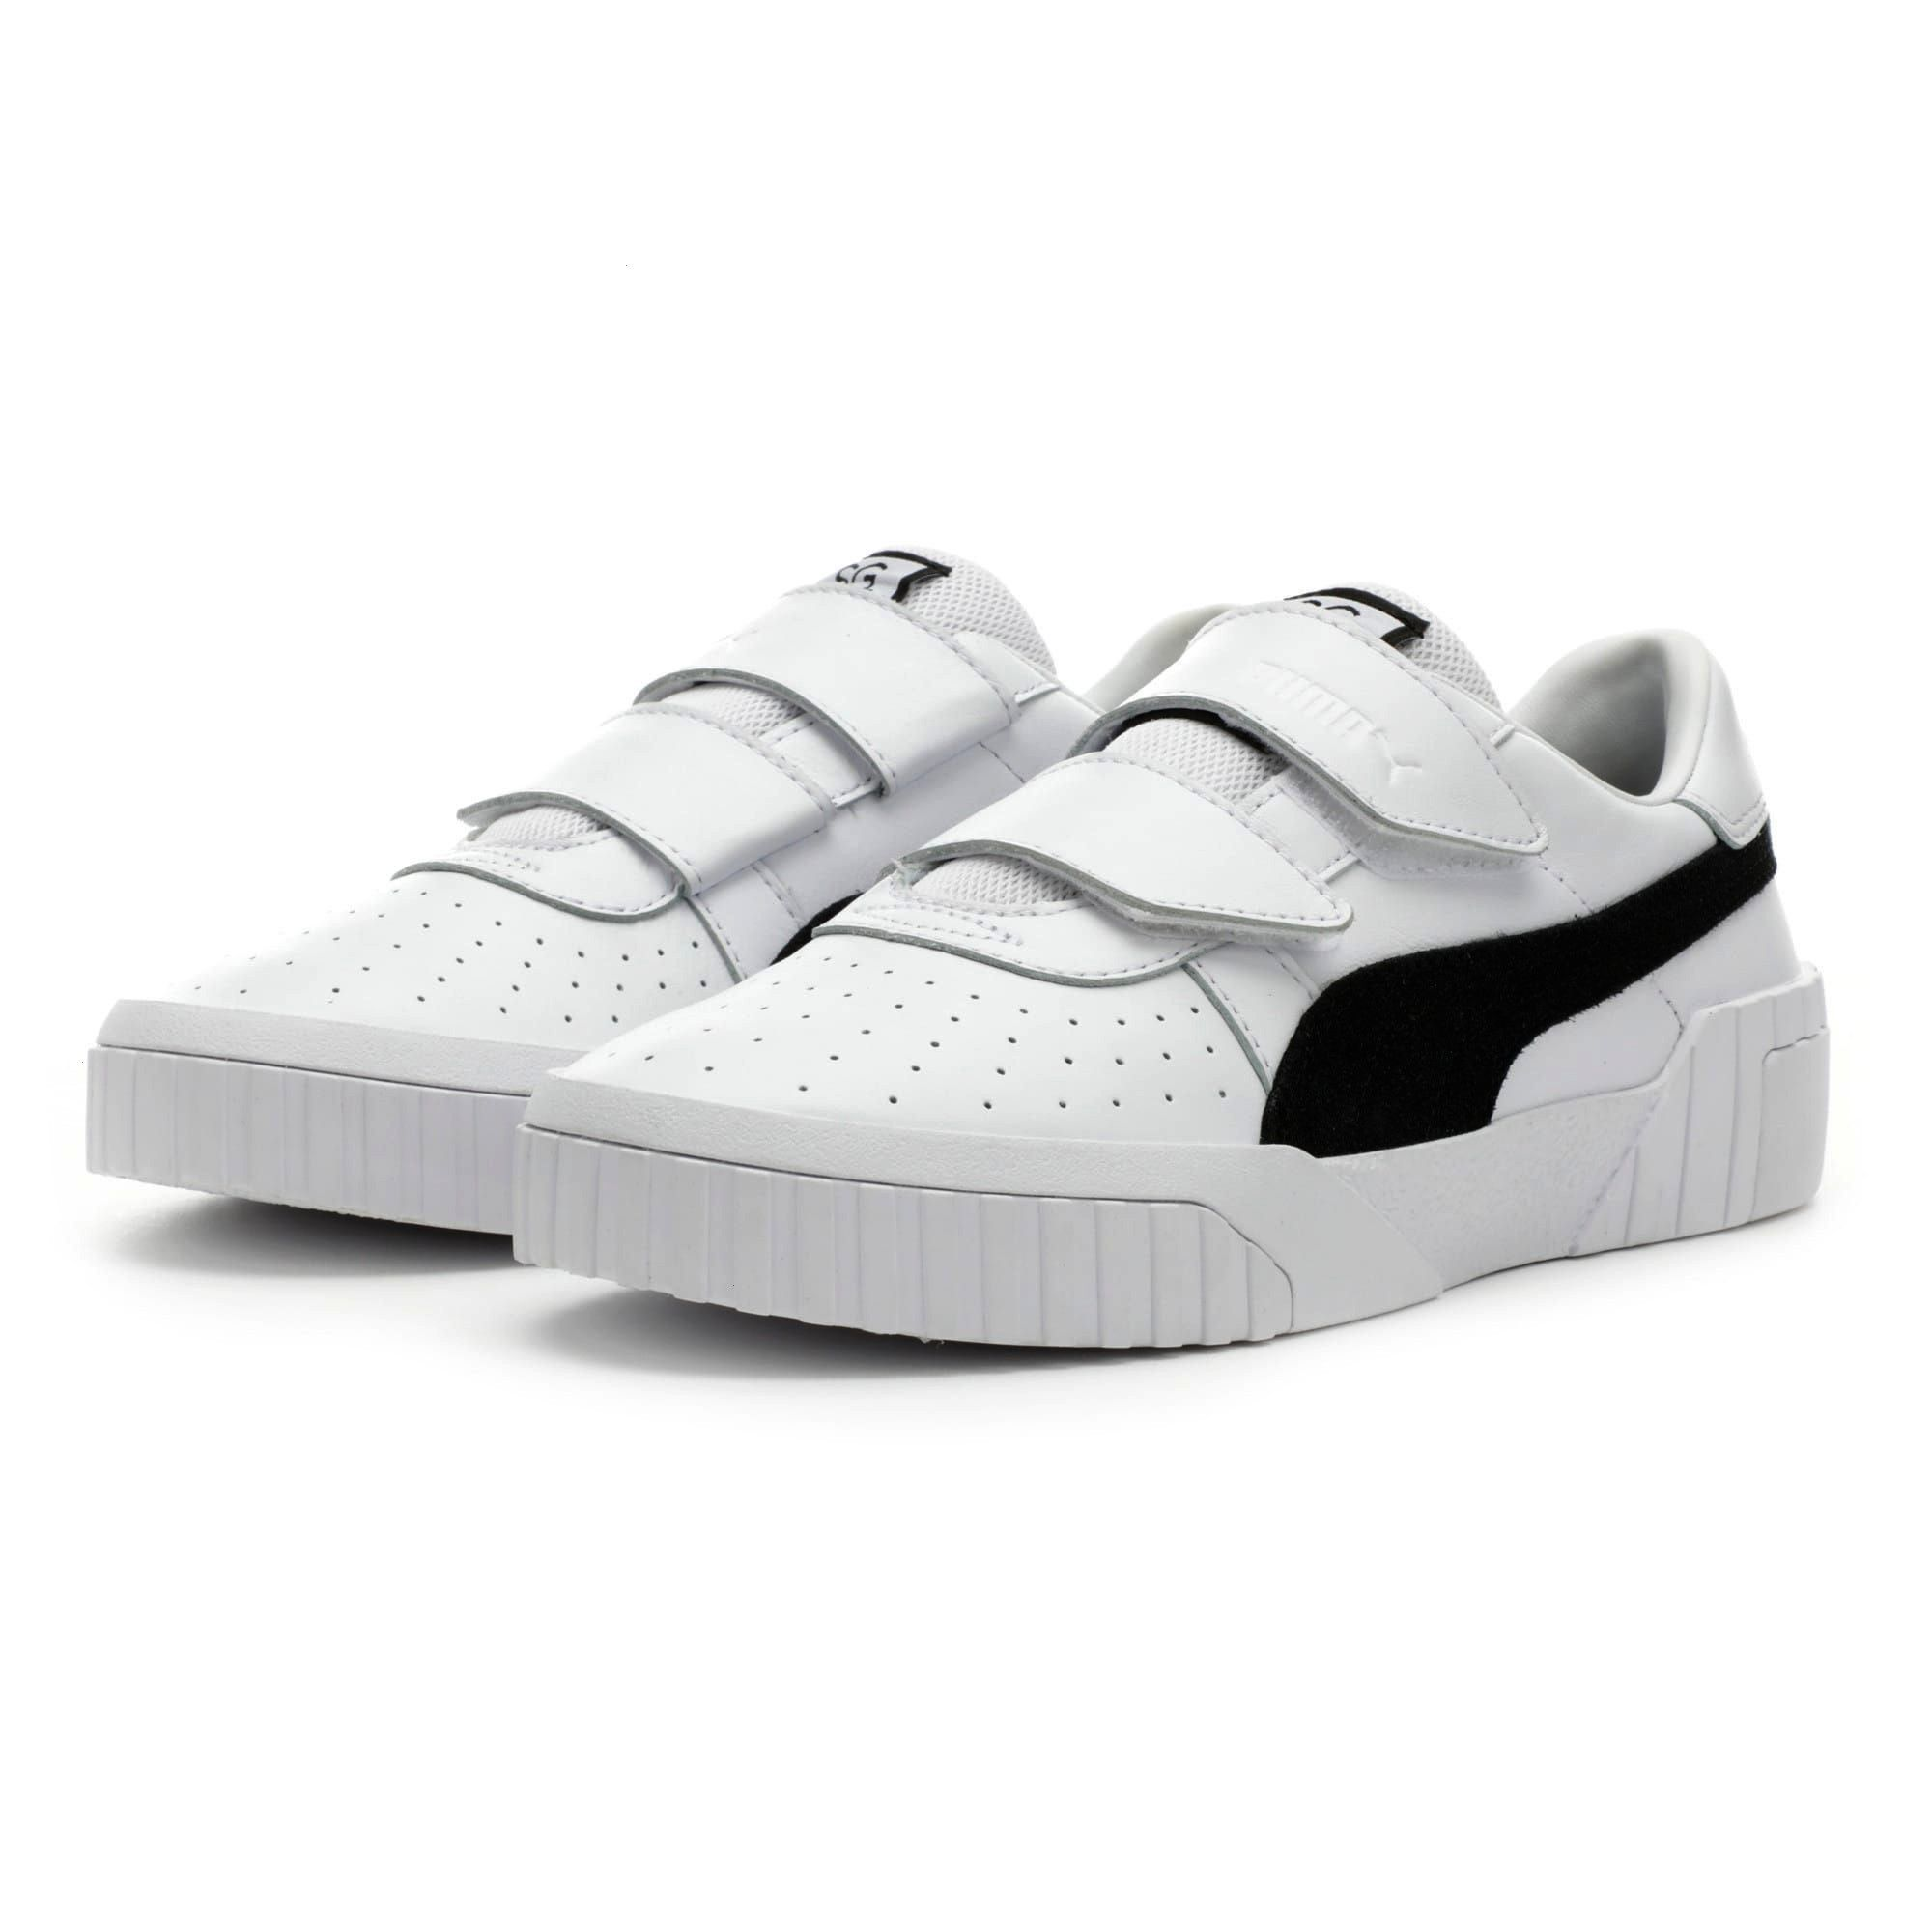 official puma store puma california remix womens sneakers